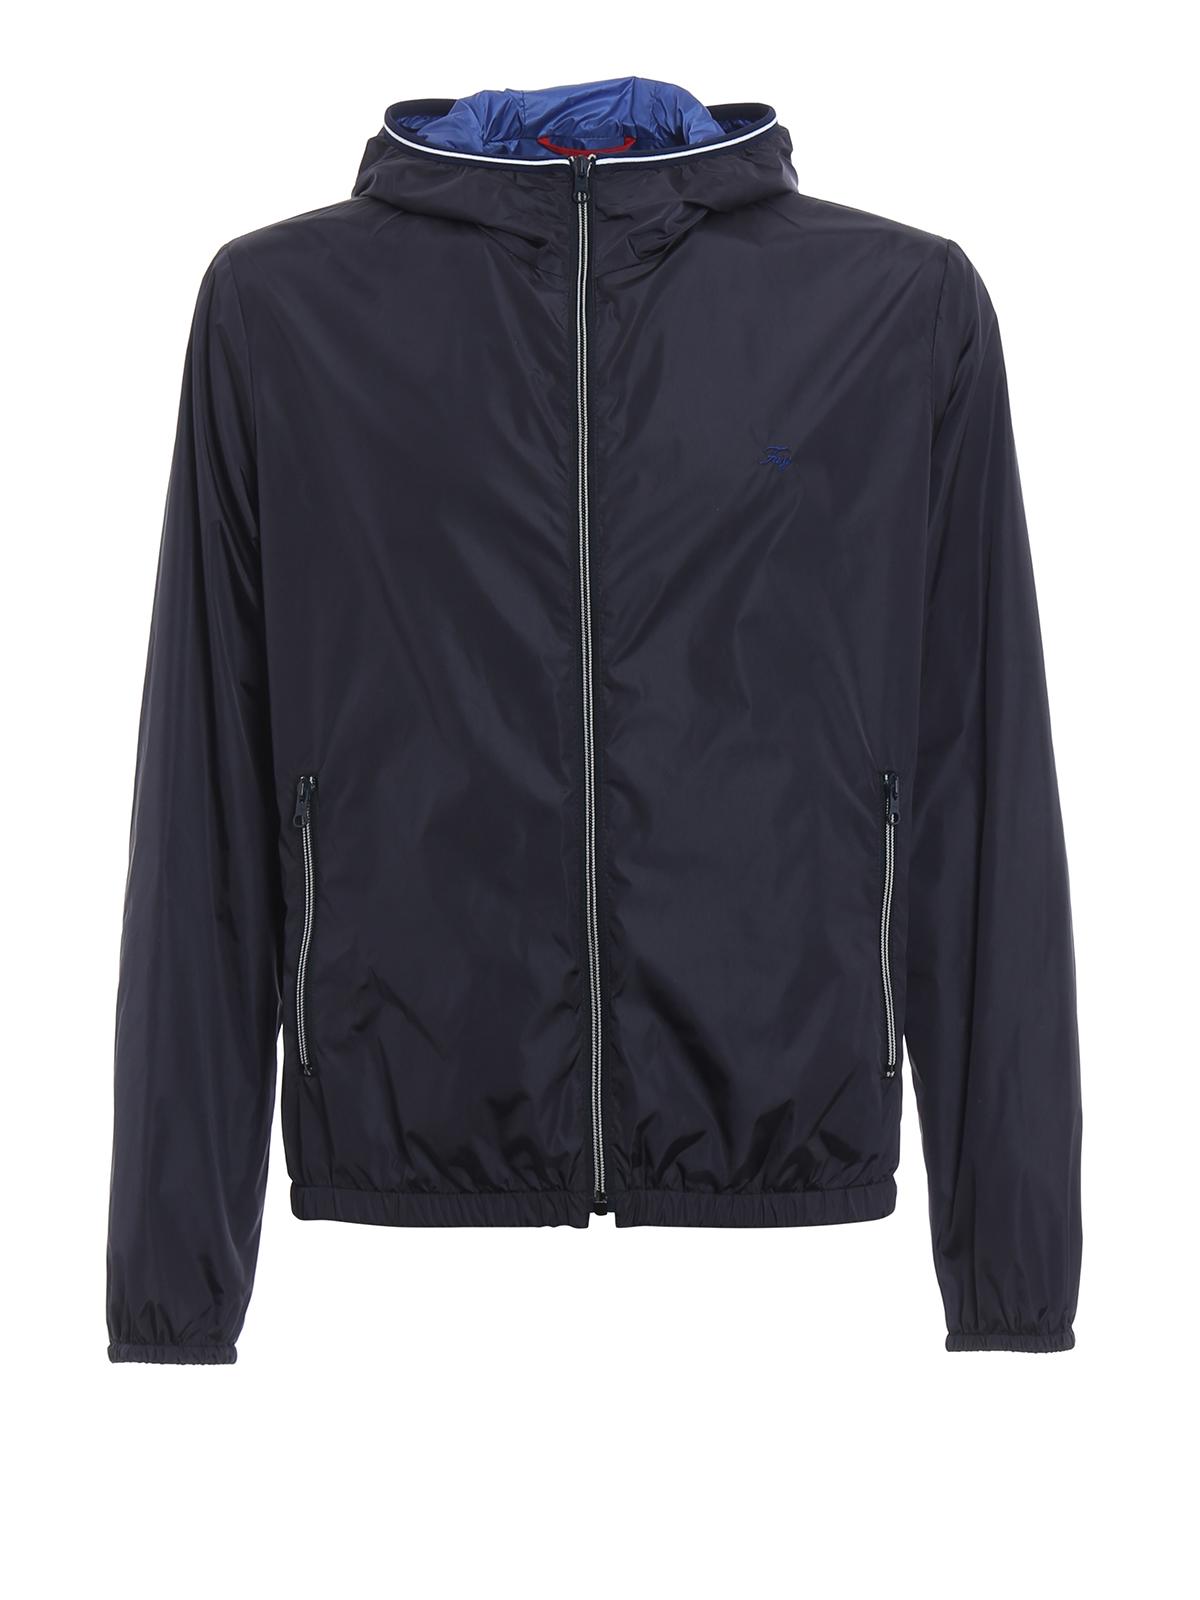 Light Nylon Jacket 91